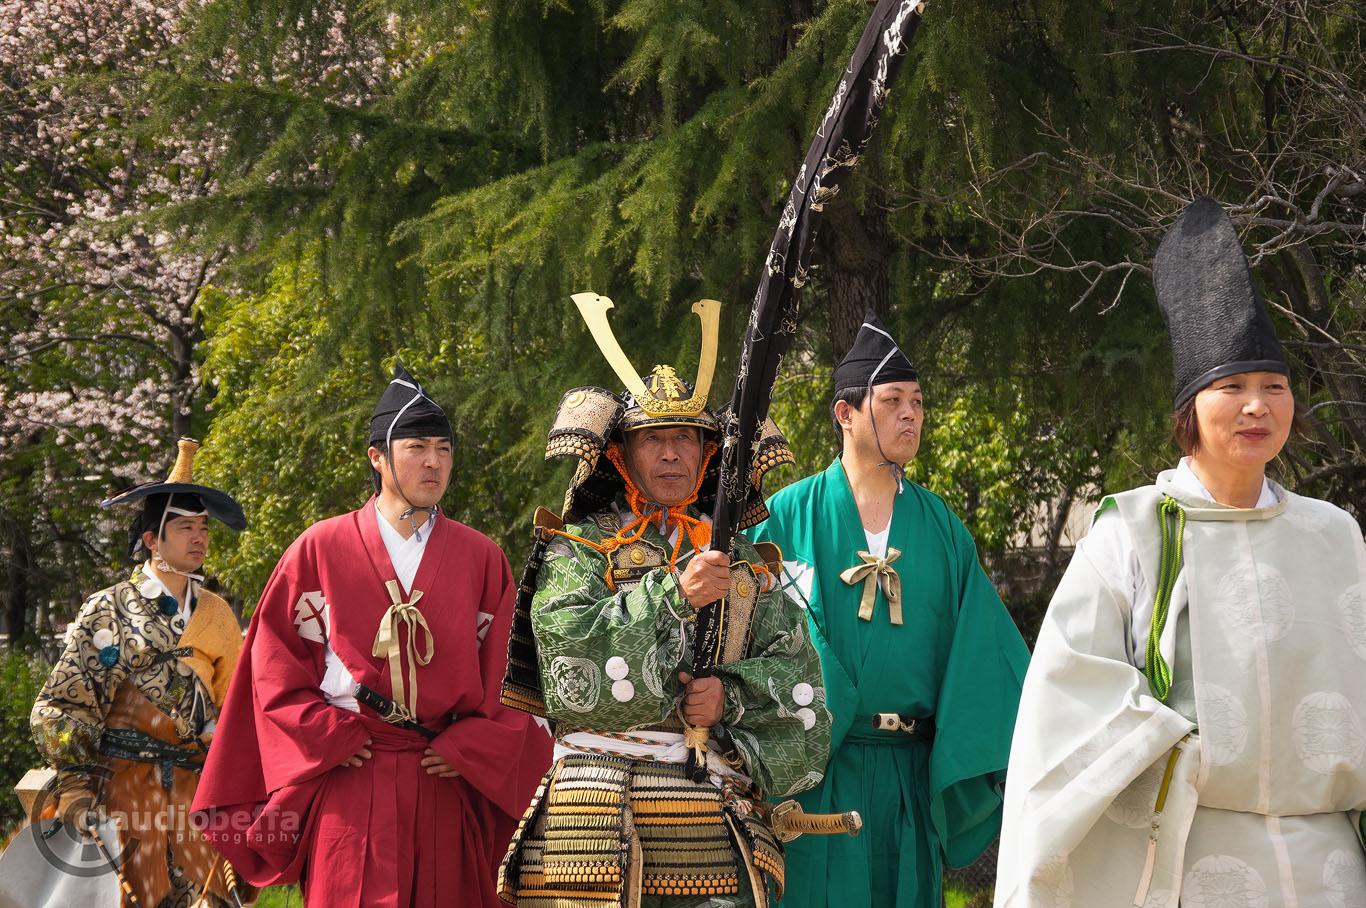 Japan, Yabusame, Traditional mounted archery, ending parade